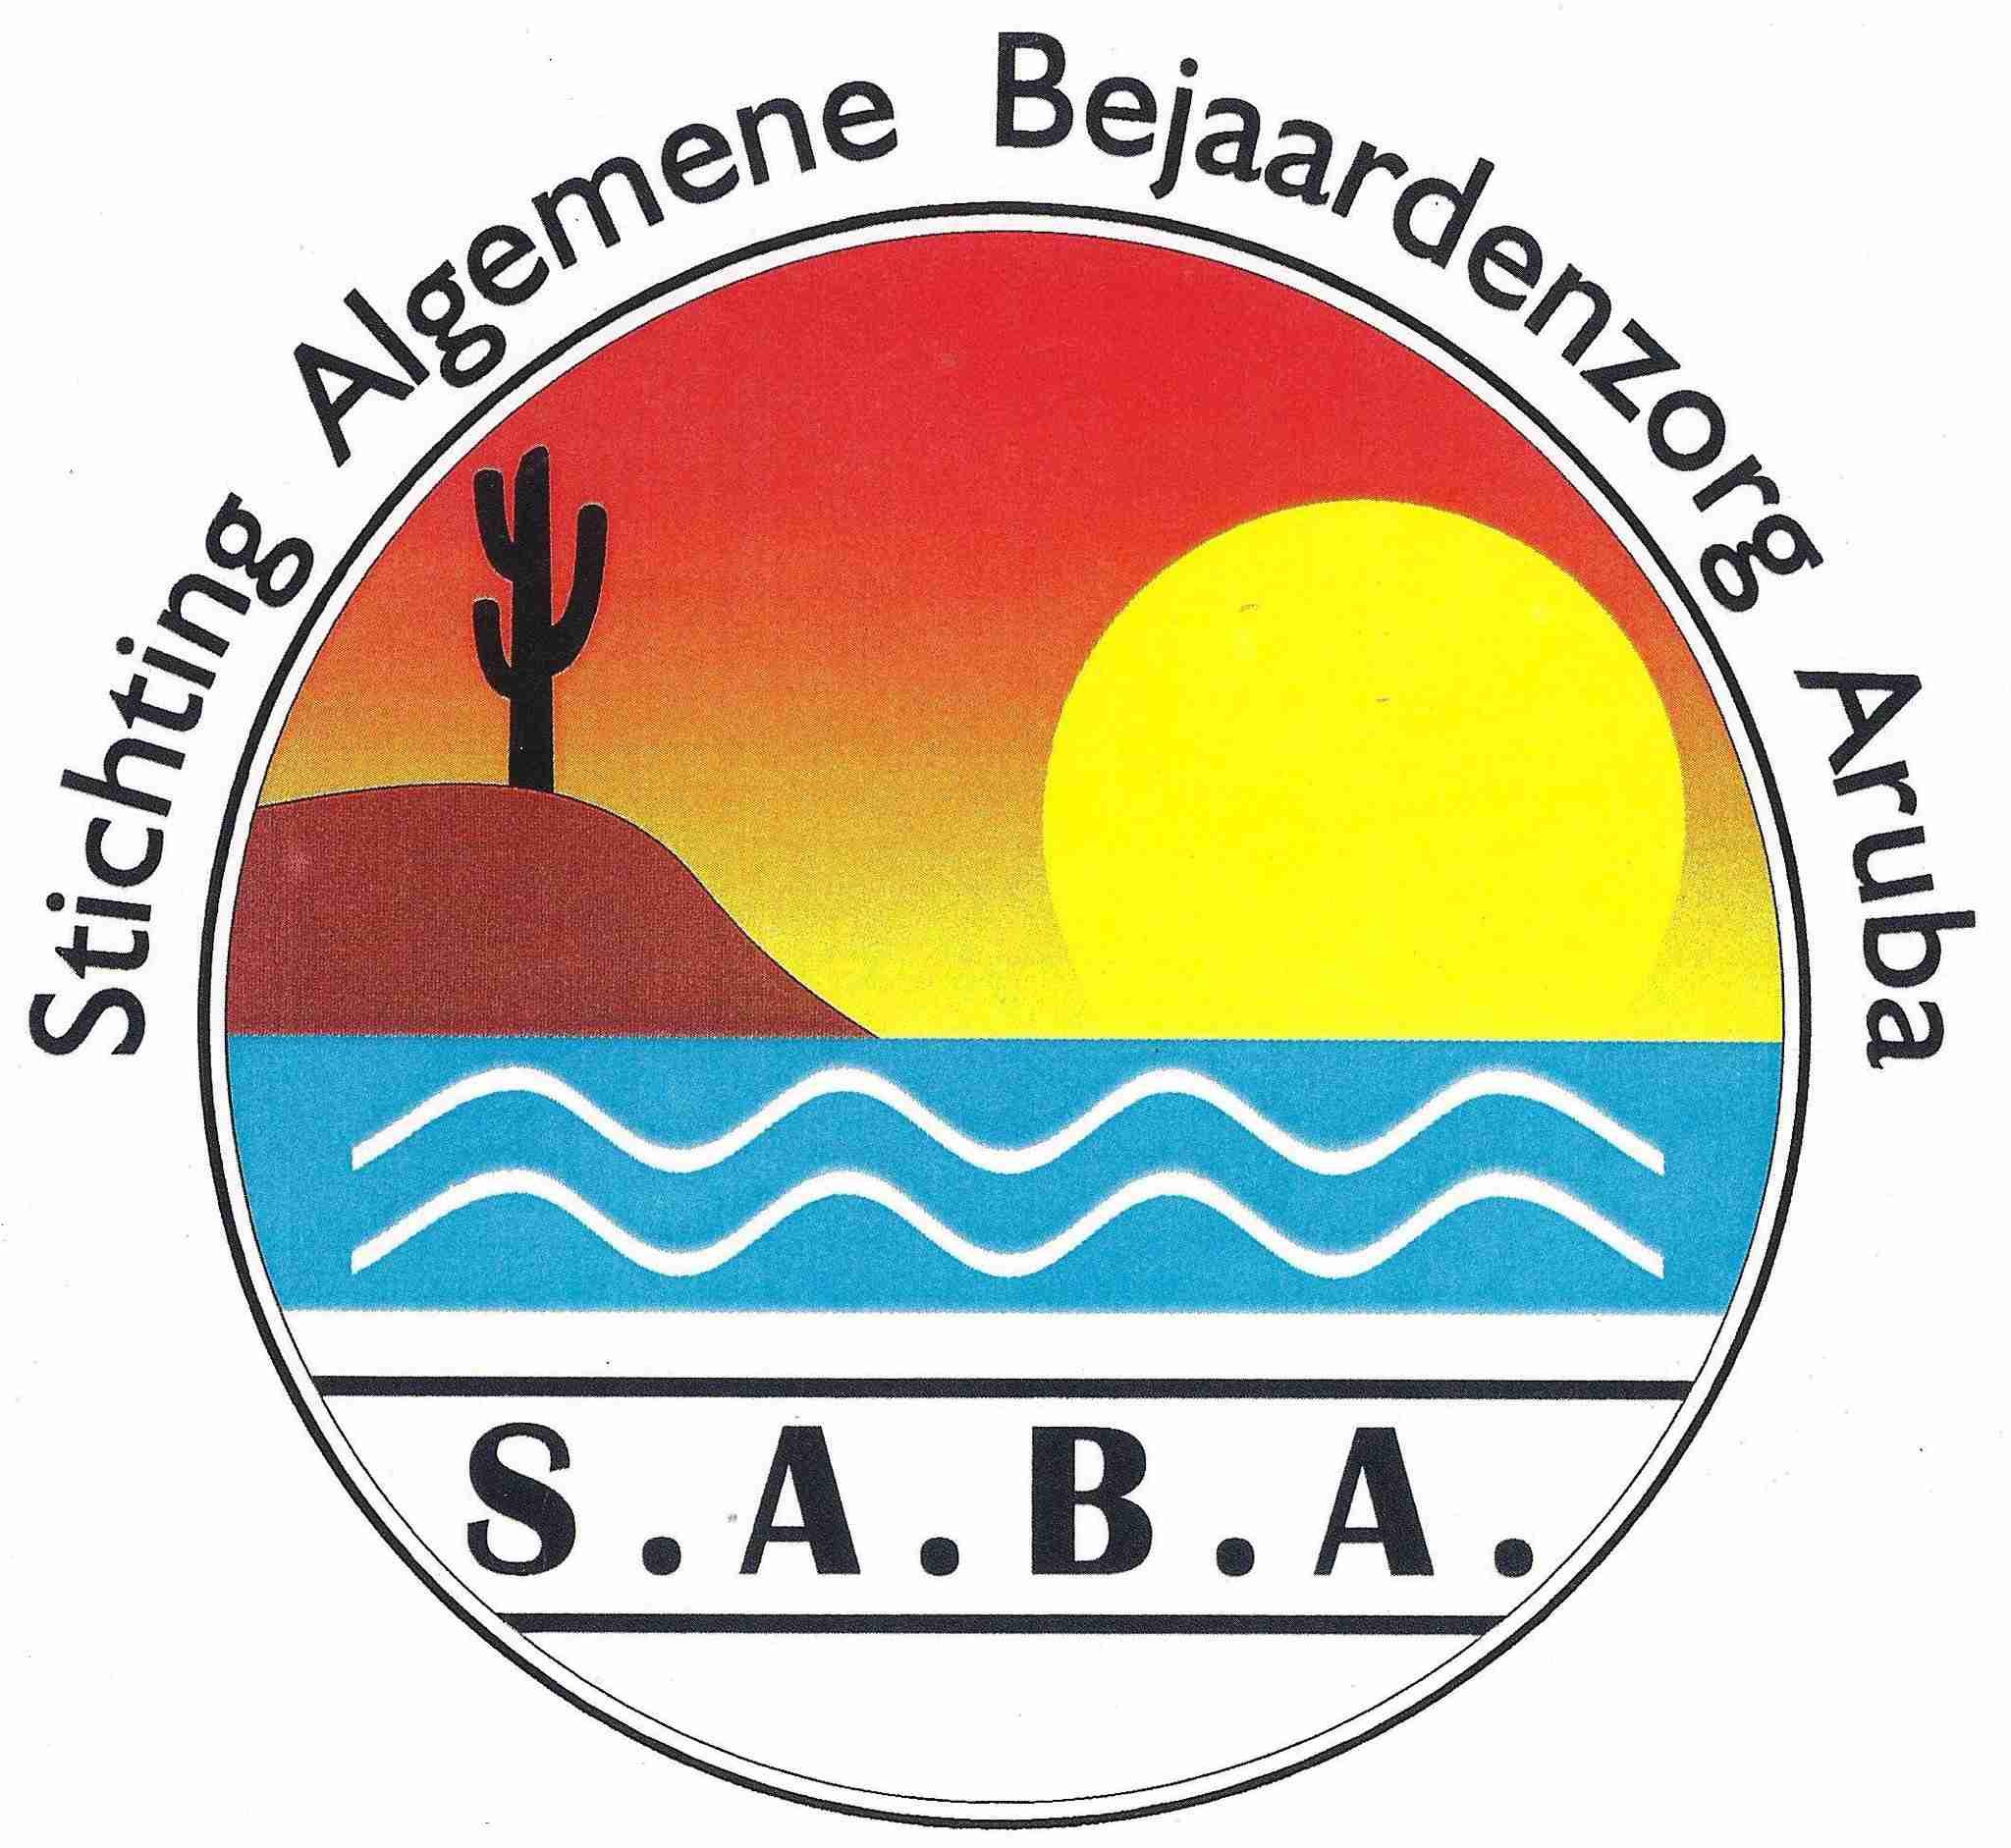 Stichting Algemene Bejaardenzorg Aruba